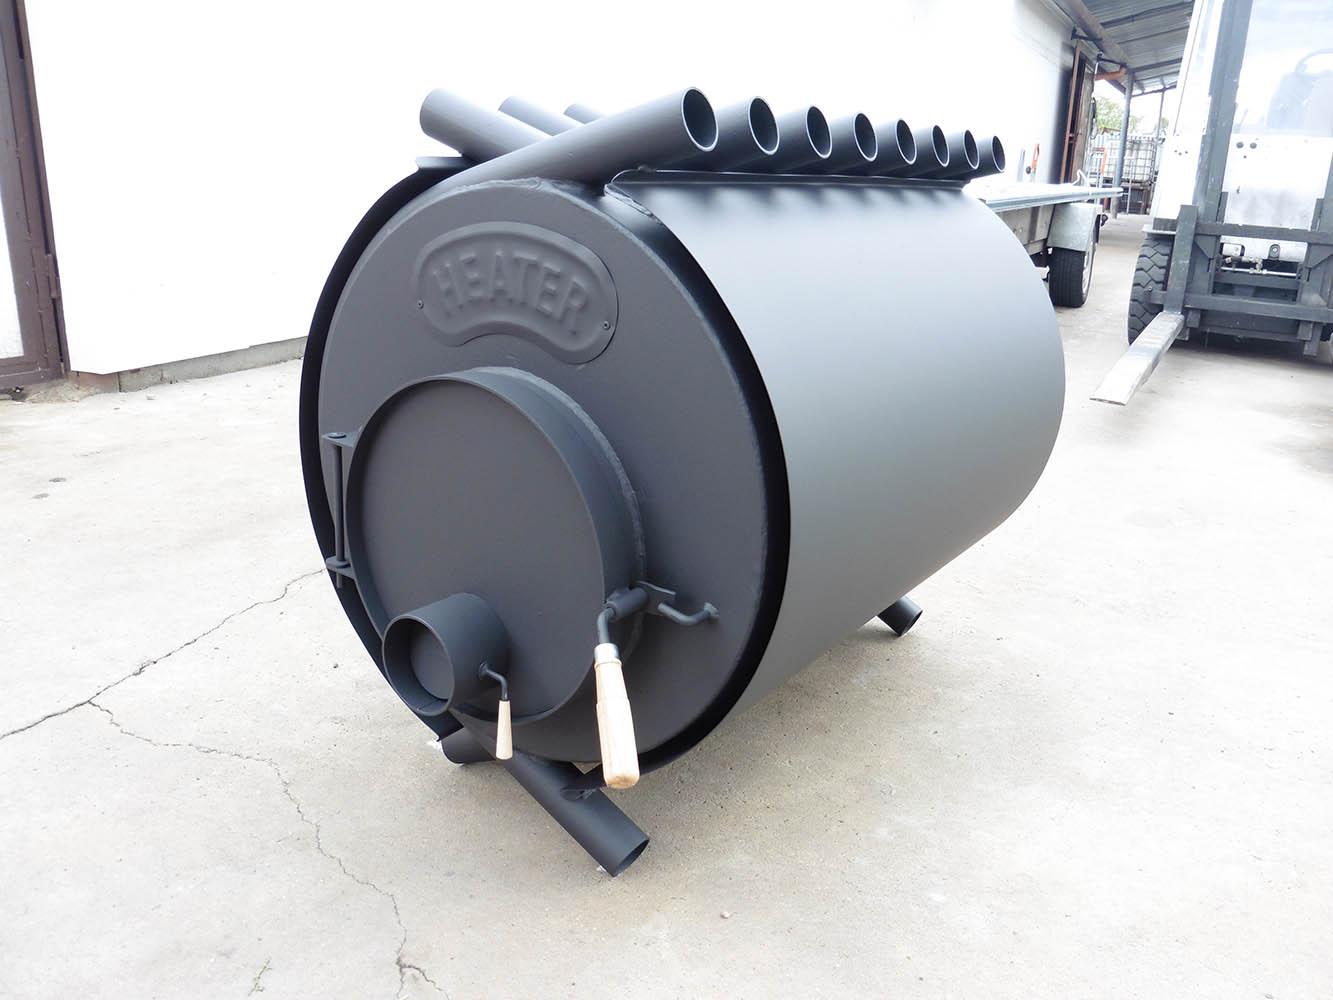 galerie warmluft fen f r holz heater warmluft holz fen heater. Black Bedroom Furniture Sets. Home Design Ideas